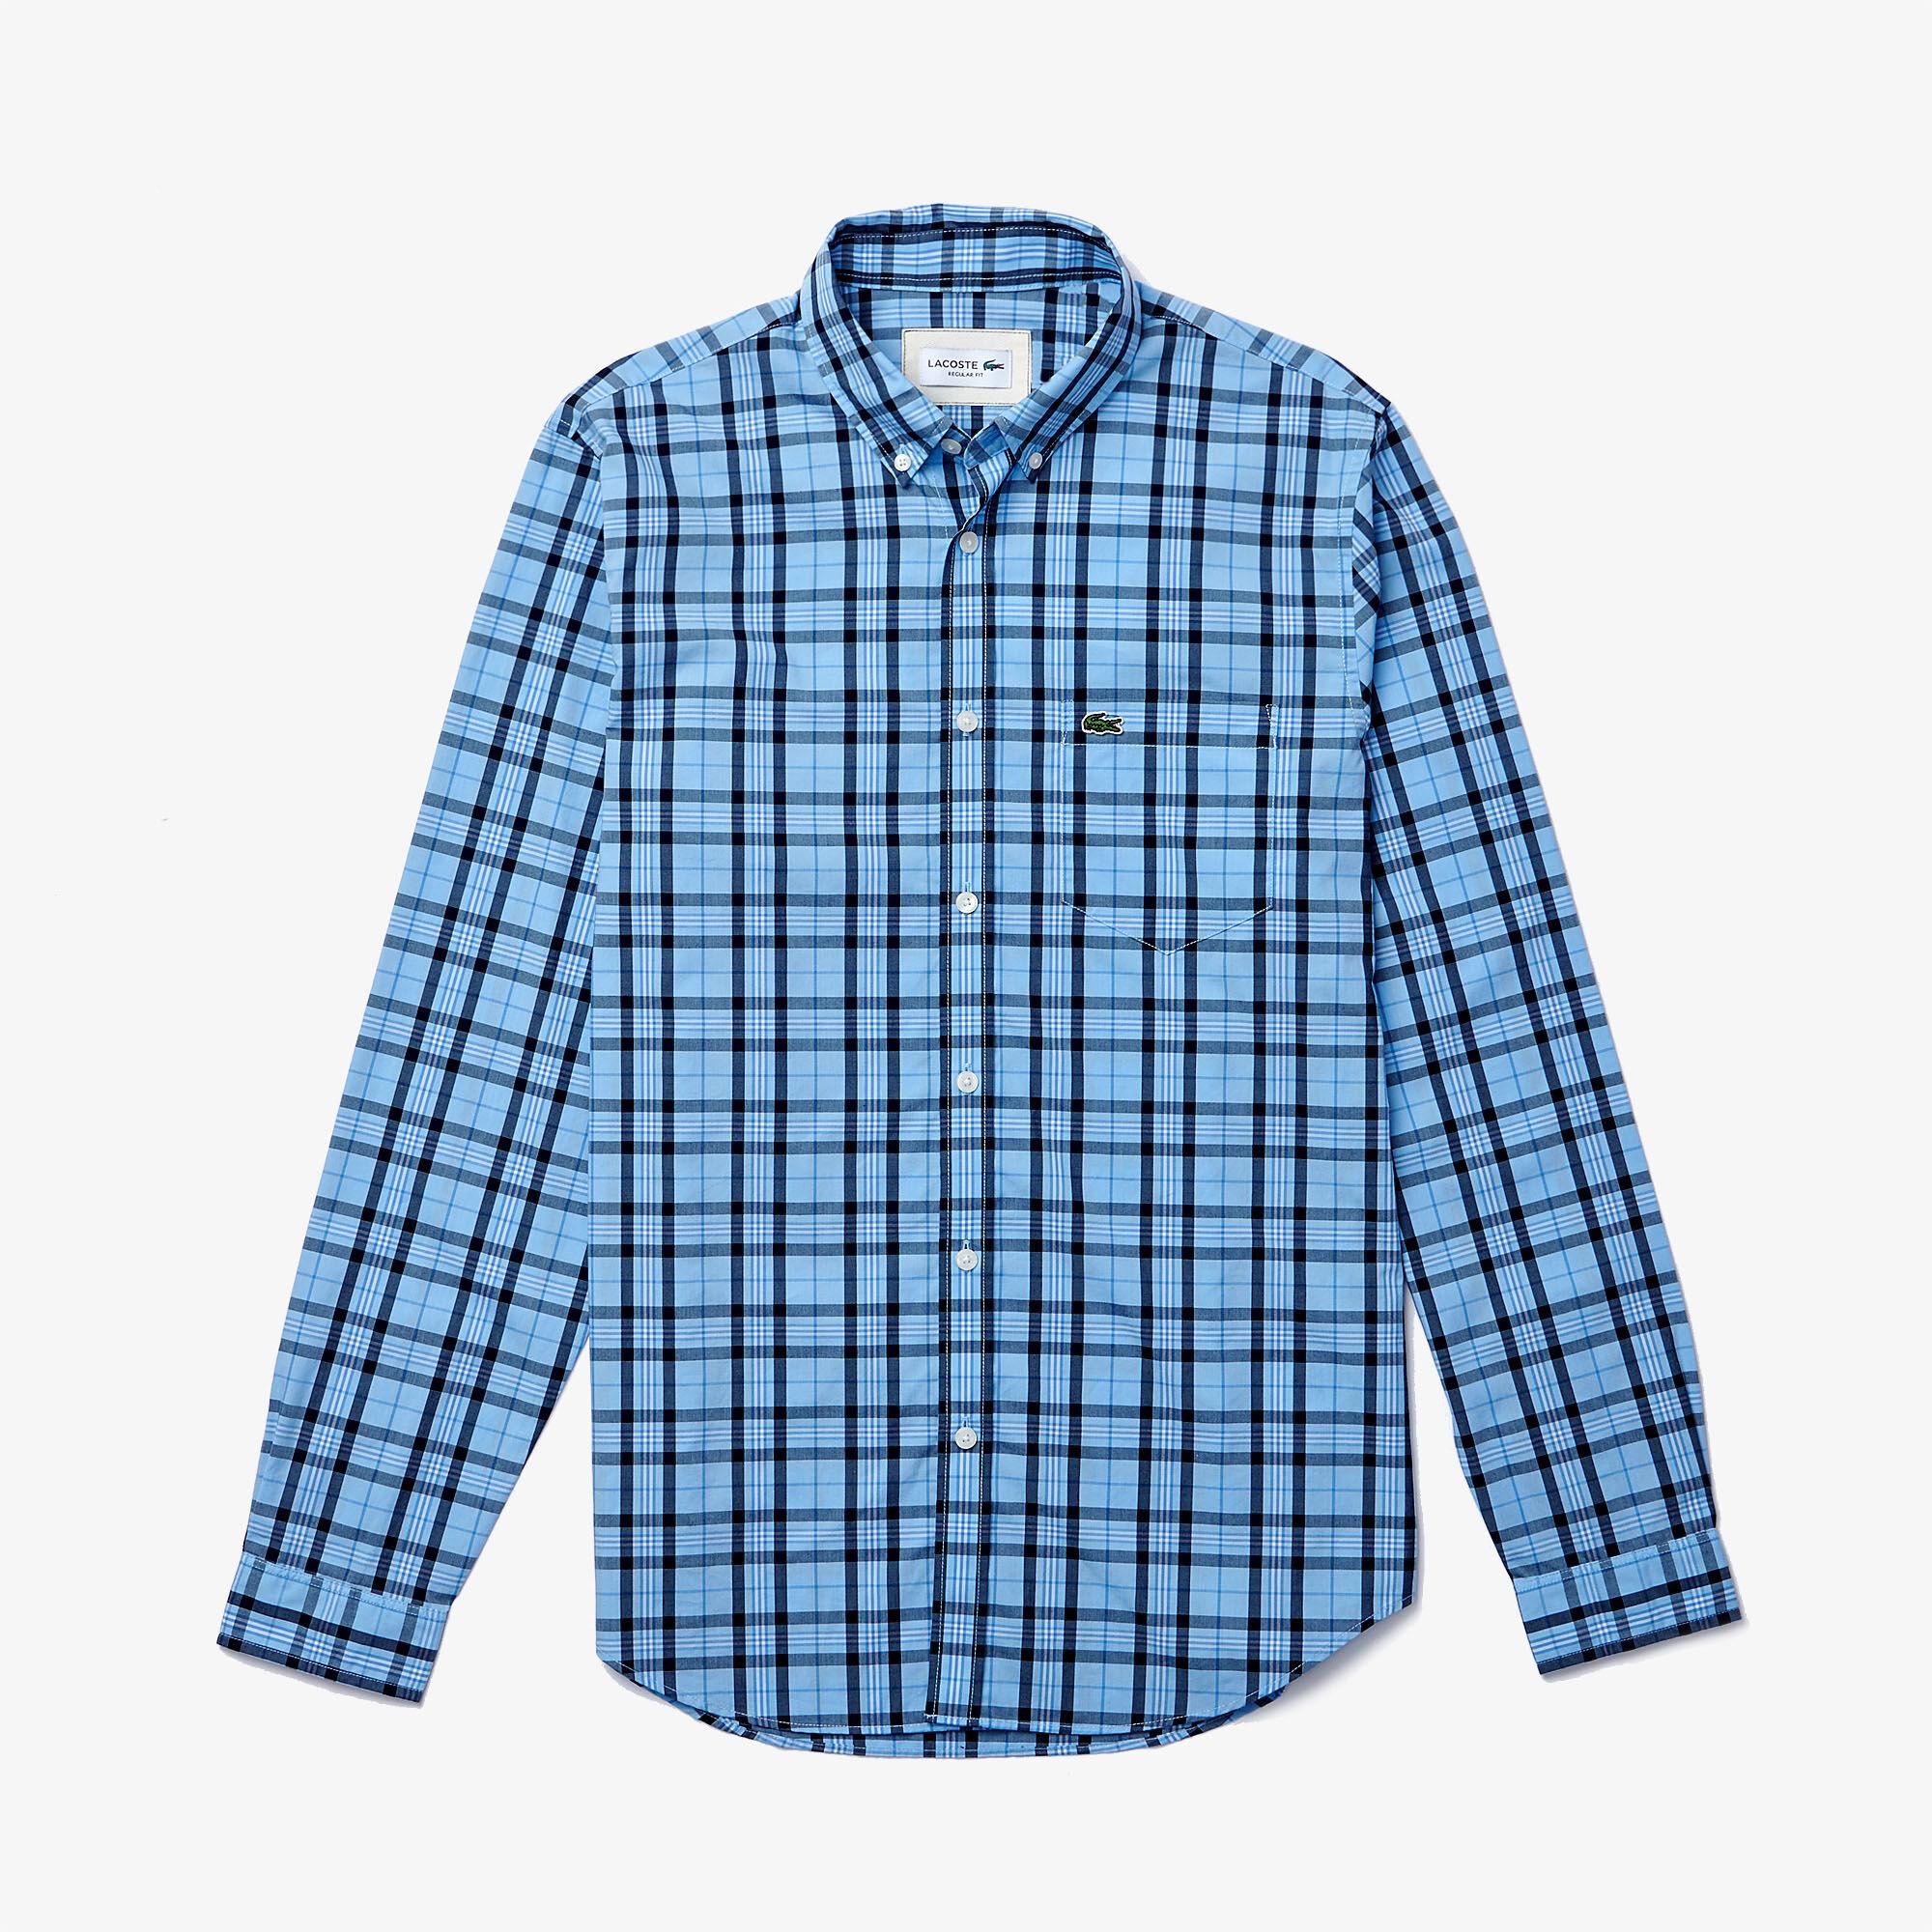 Men's Regular Fit Check Cotton Poplin Shirt